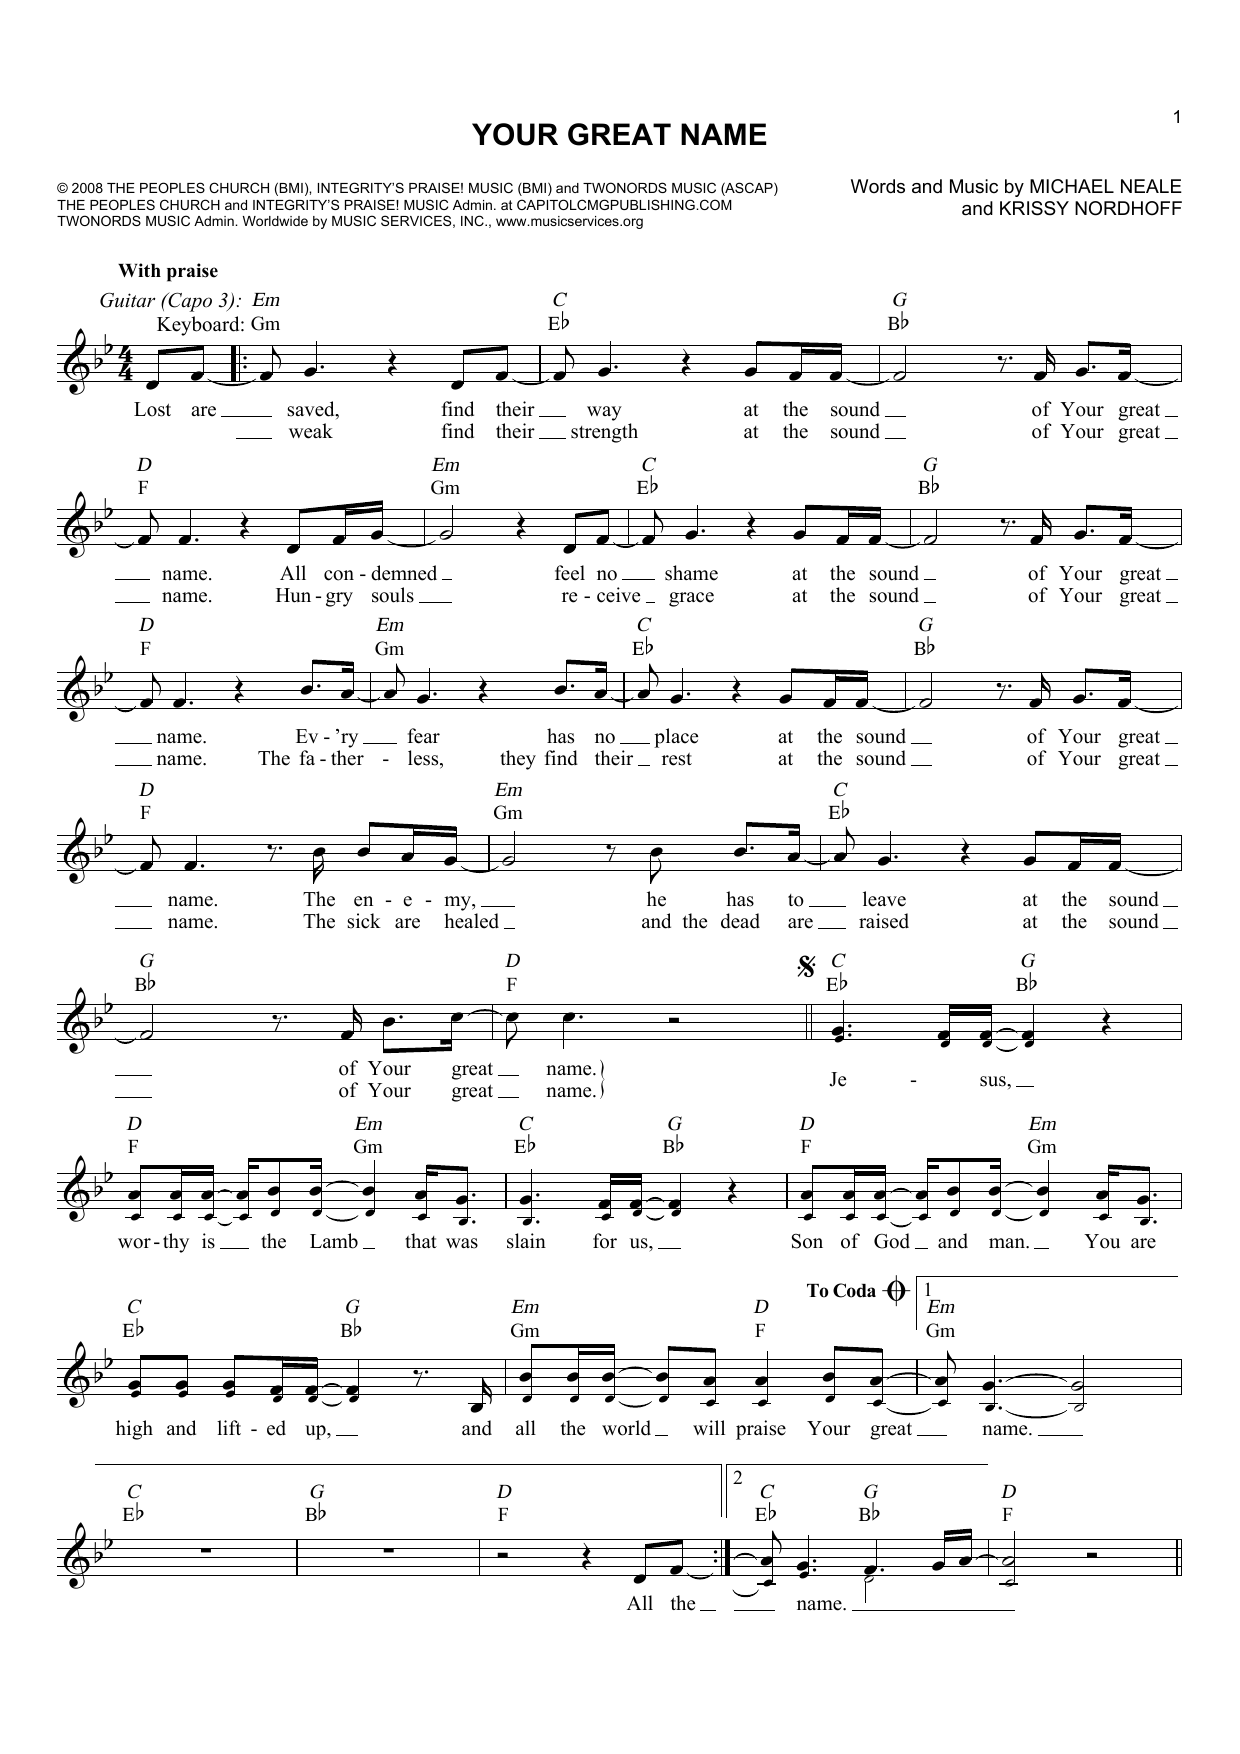 Natalie Grant 'Your Great Name' Sheet Music Notes, Chords | Download  Printable Melody Line, Lyrics & Chords - SKU: 178868